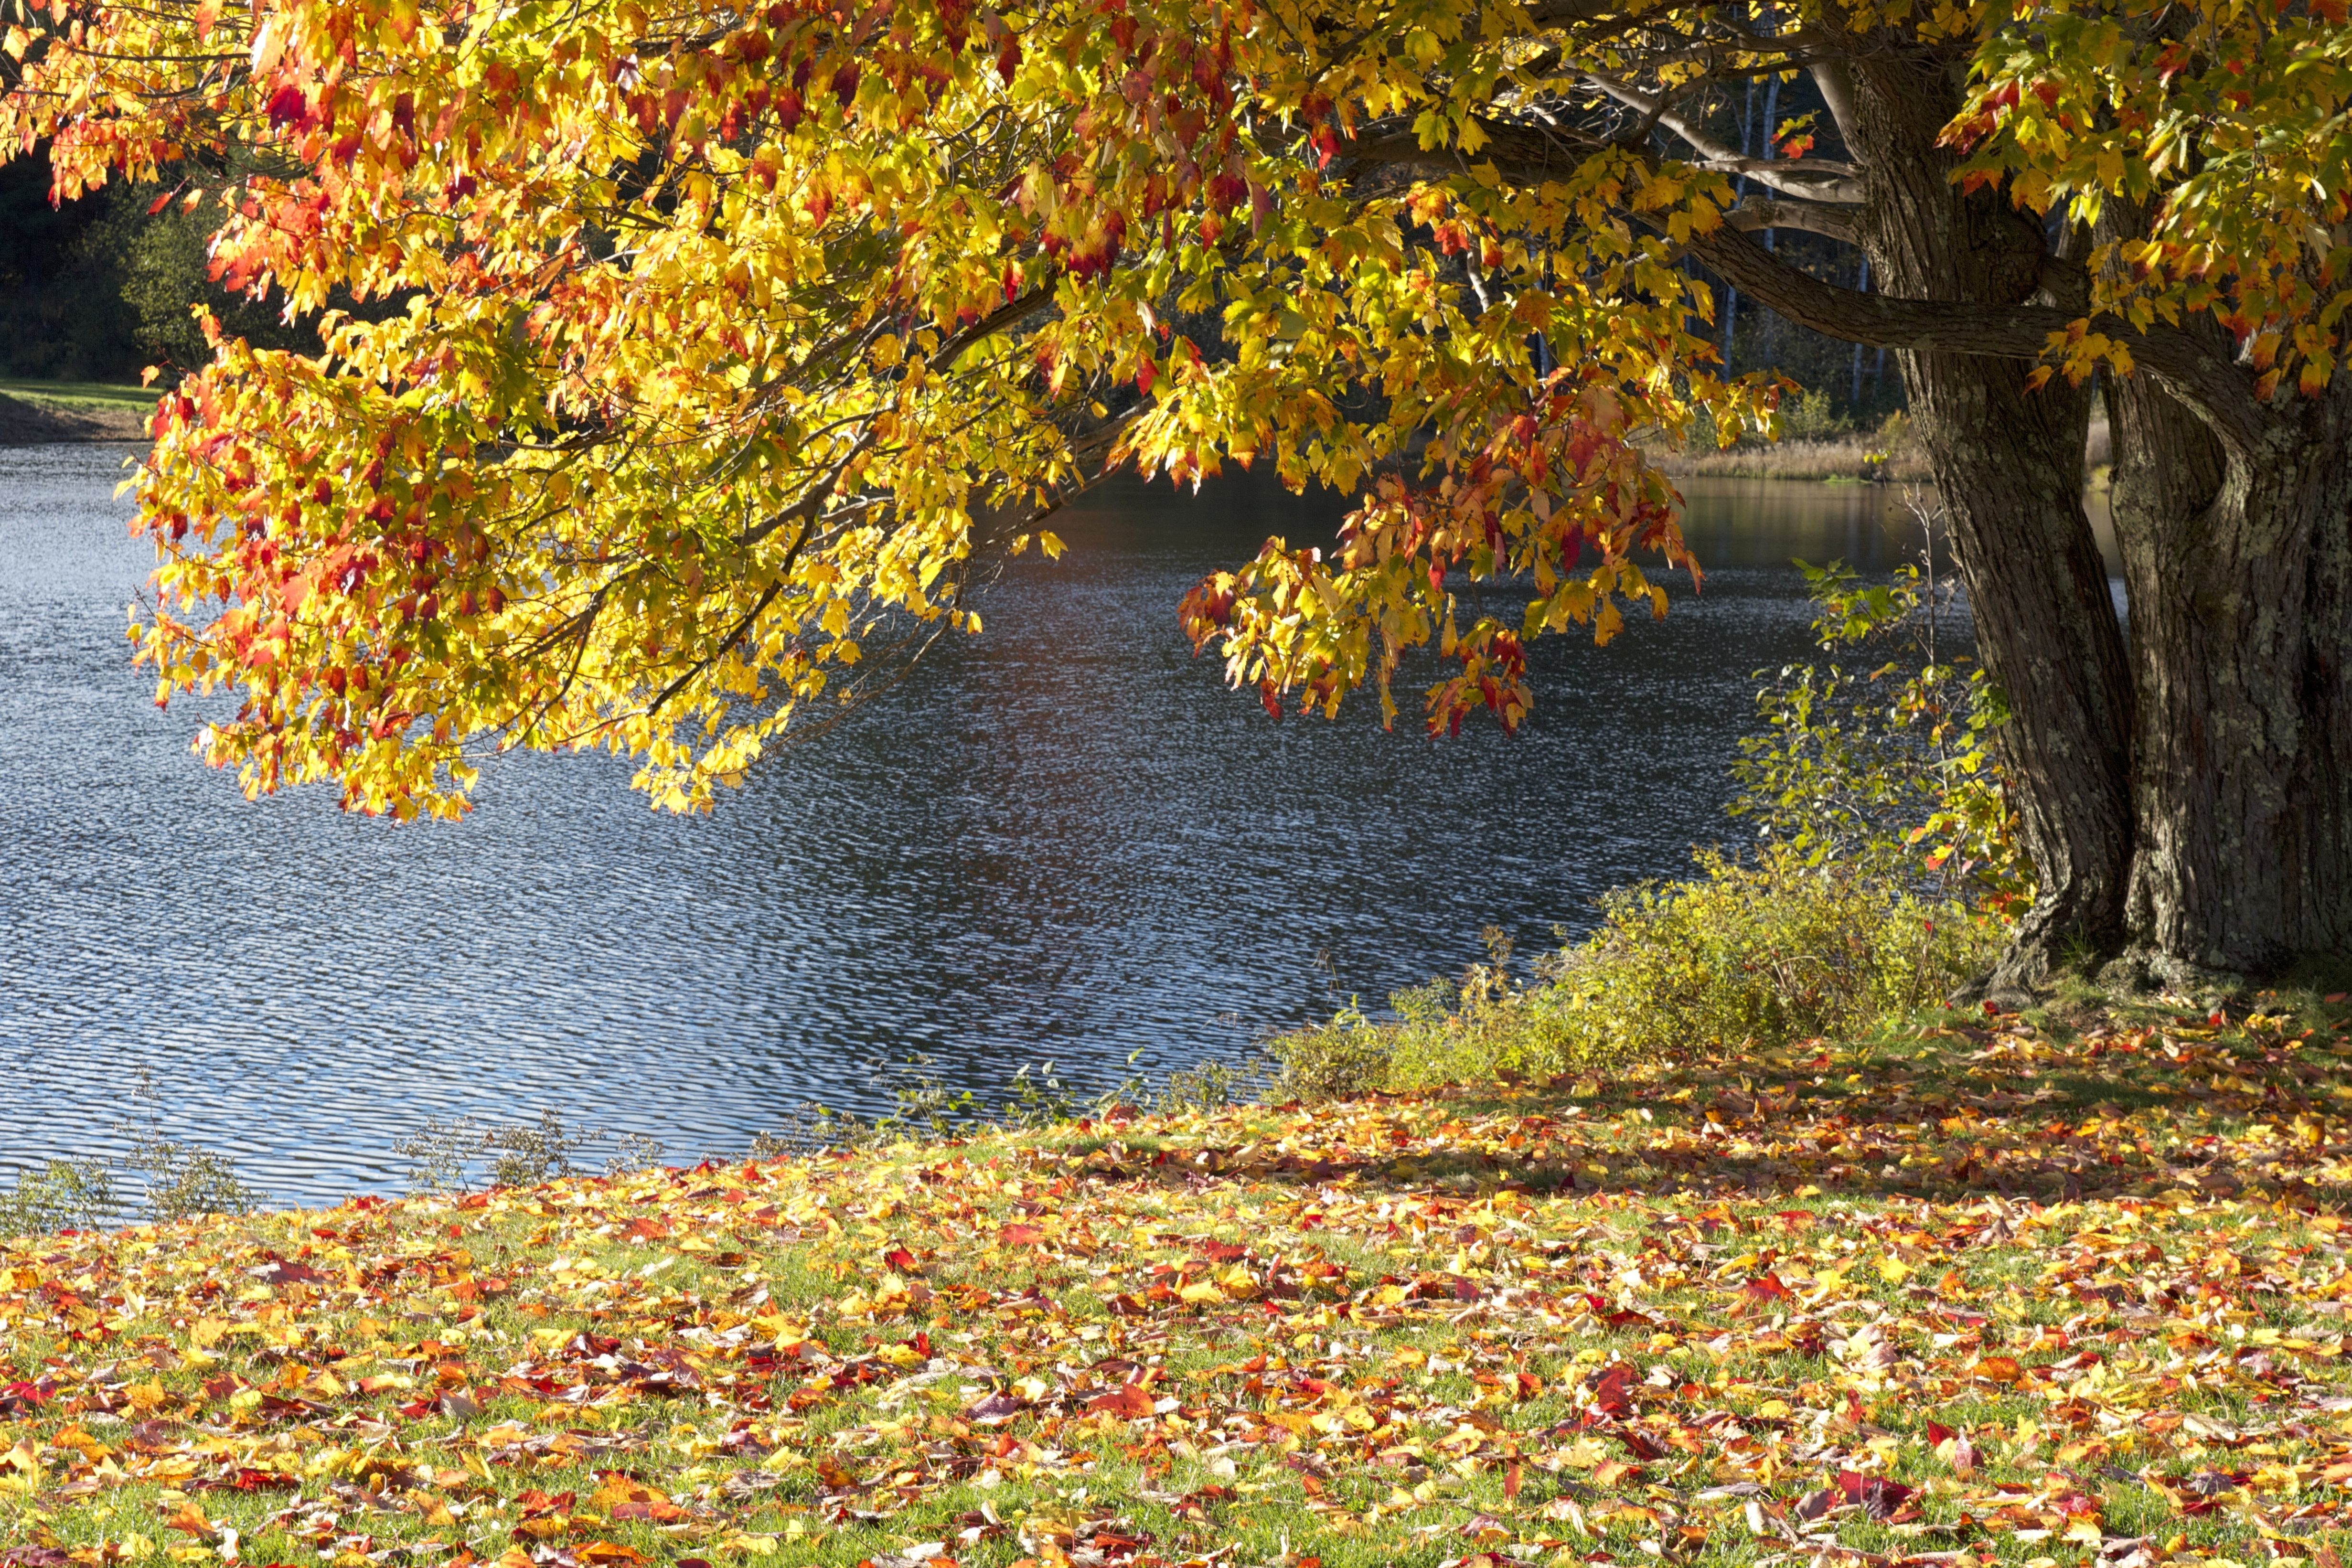 Free picture: autumn season, lake, trees, water, fall, foliage ...